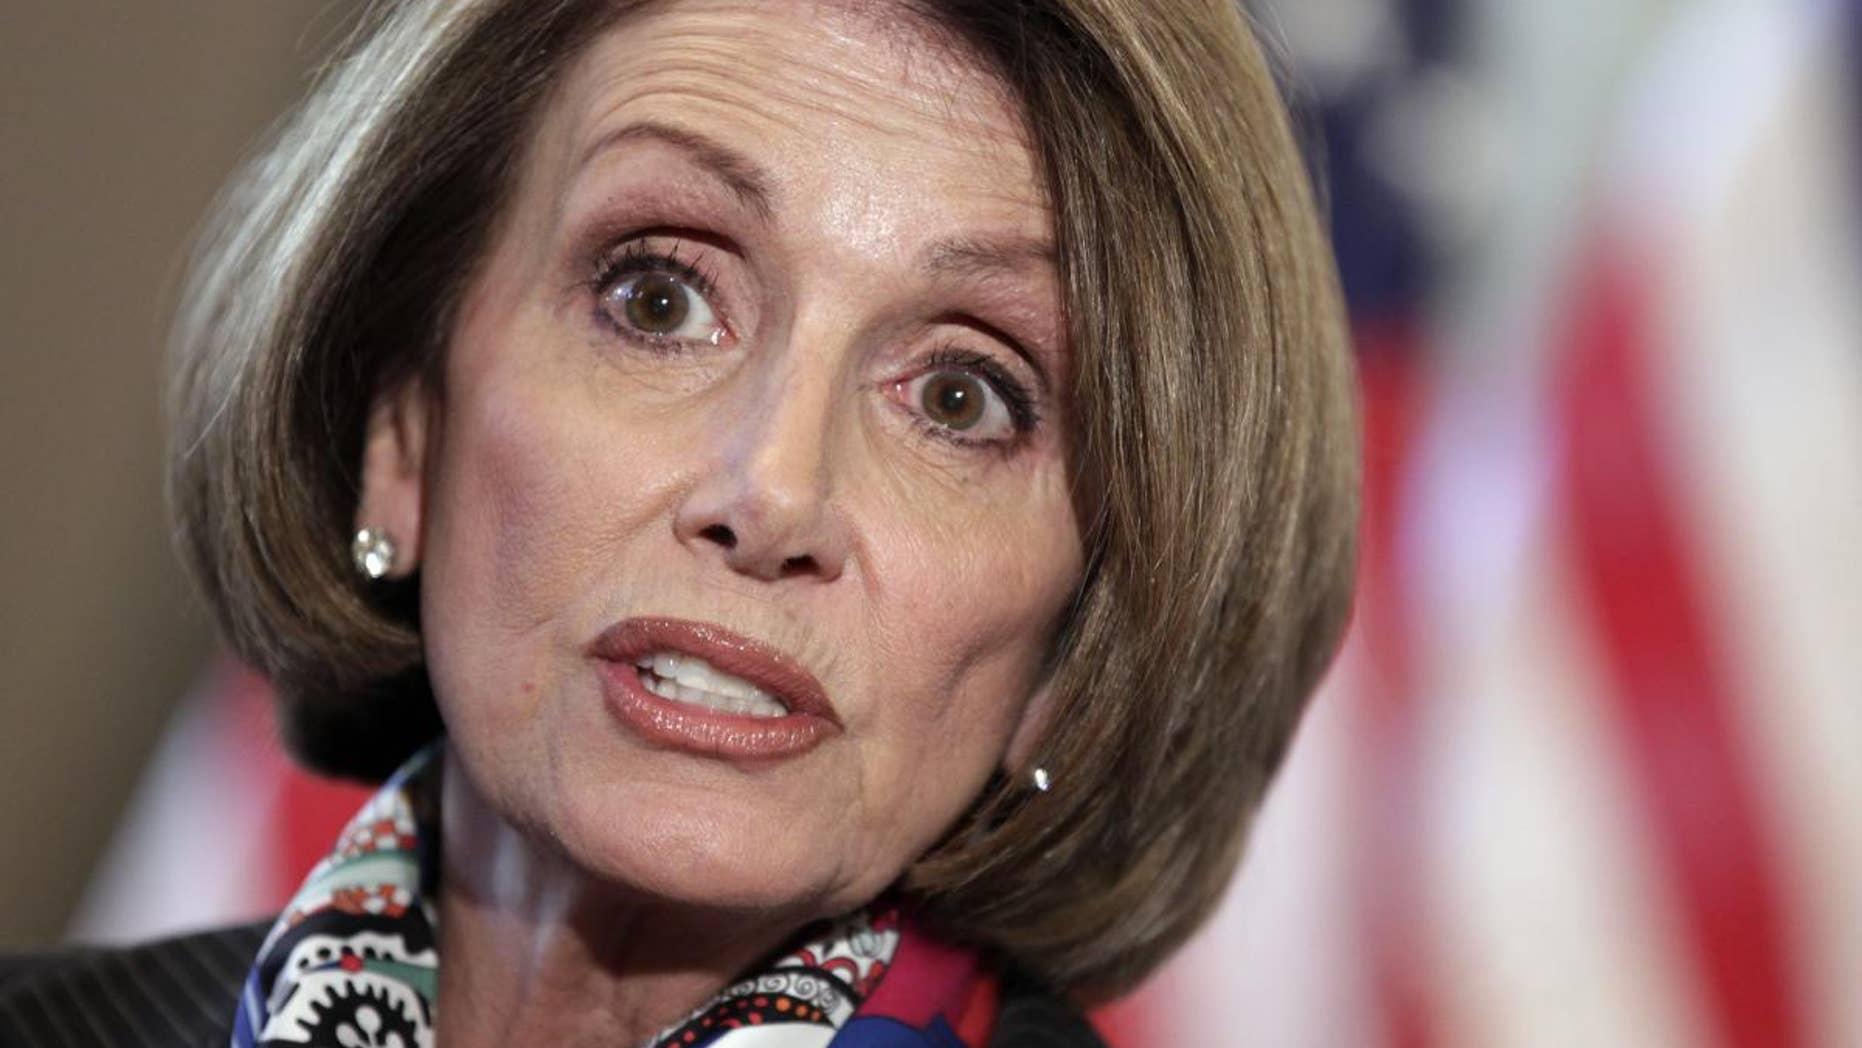 House Minority Leader Nancy Pelosi, D-Calif. (AP Photo/J. Scott Applewhite)